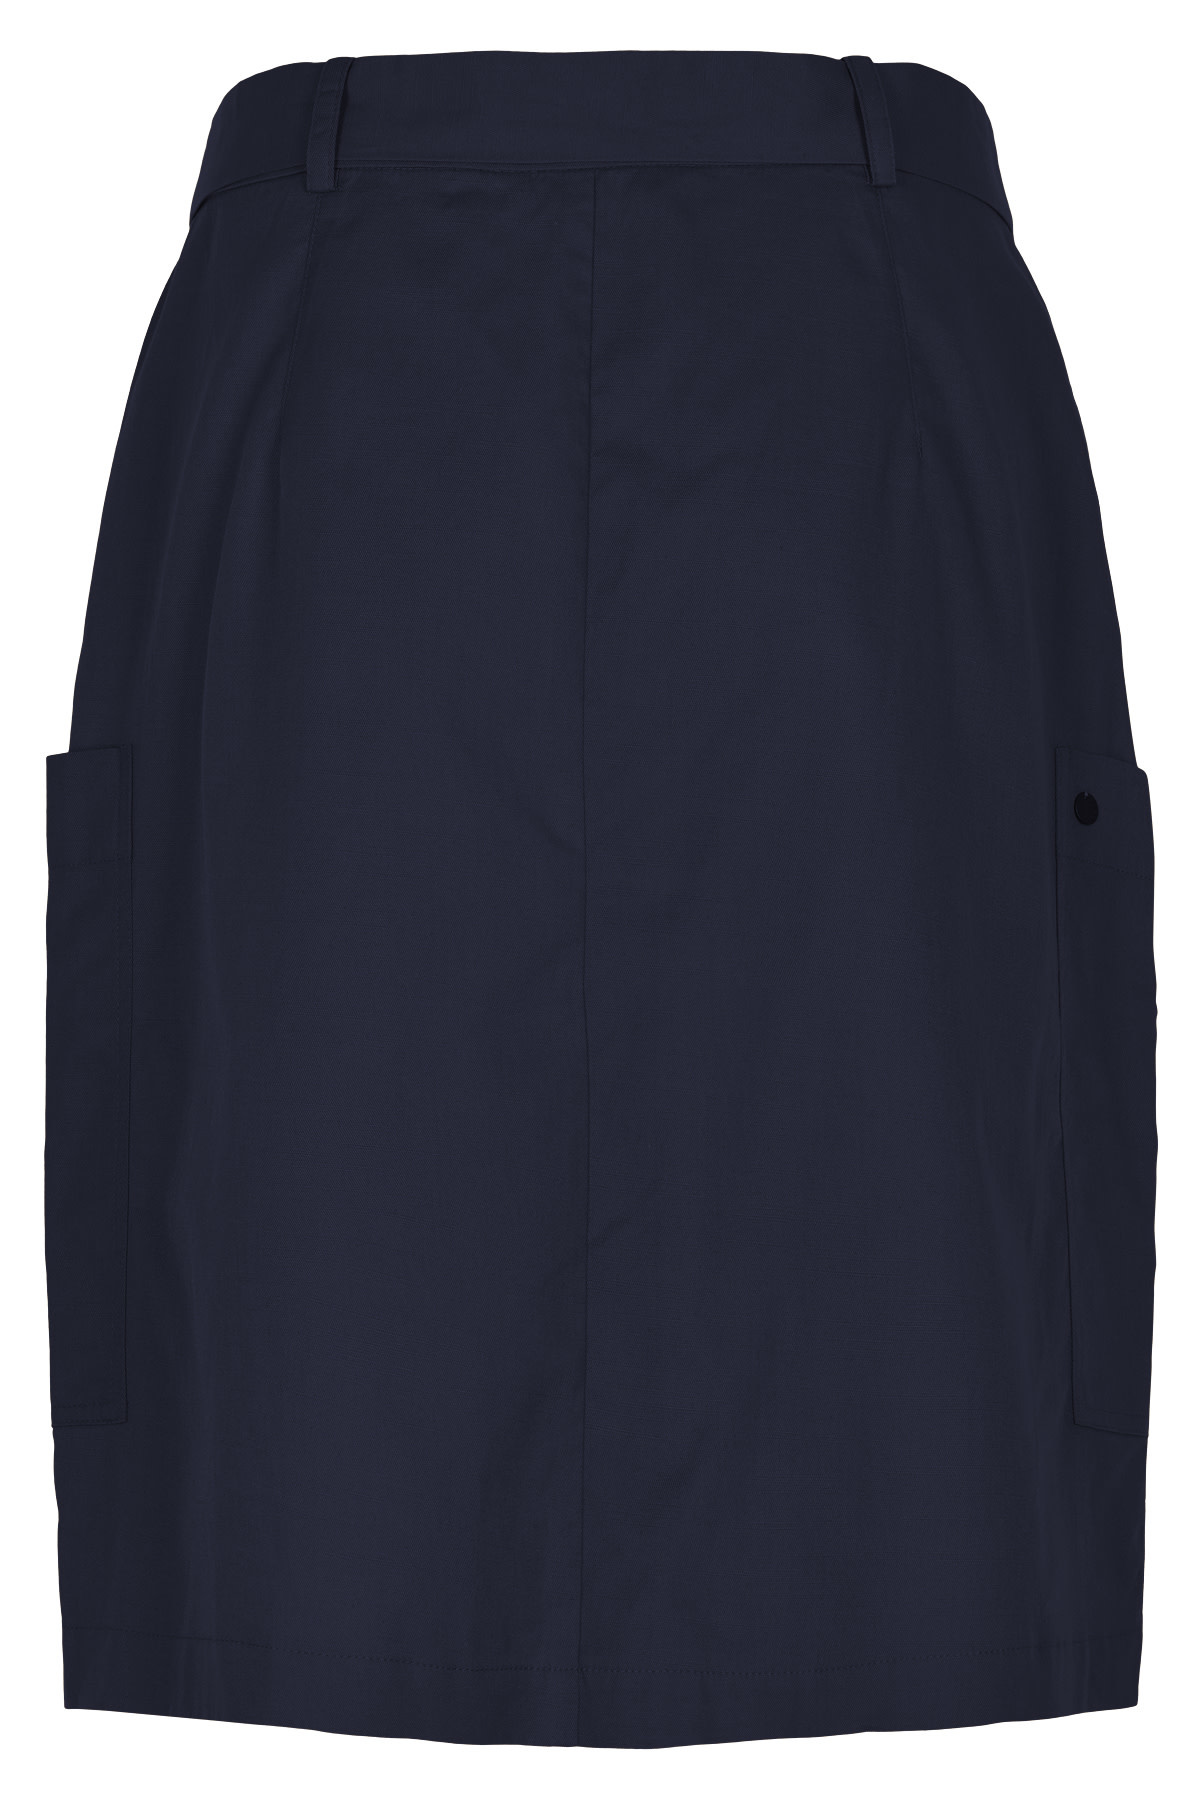 Nümph Bizzy Skirt